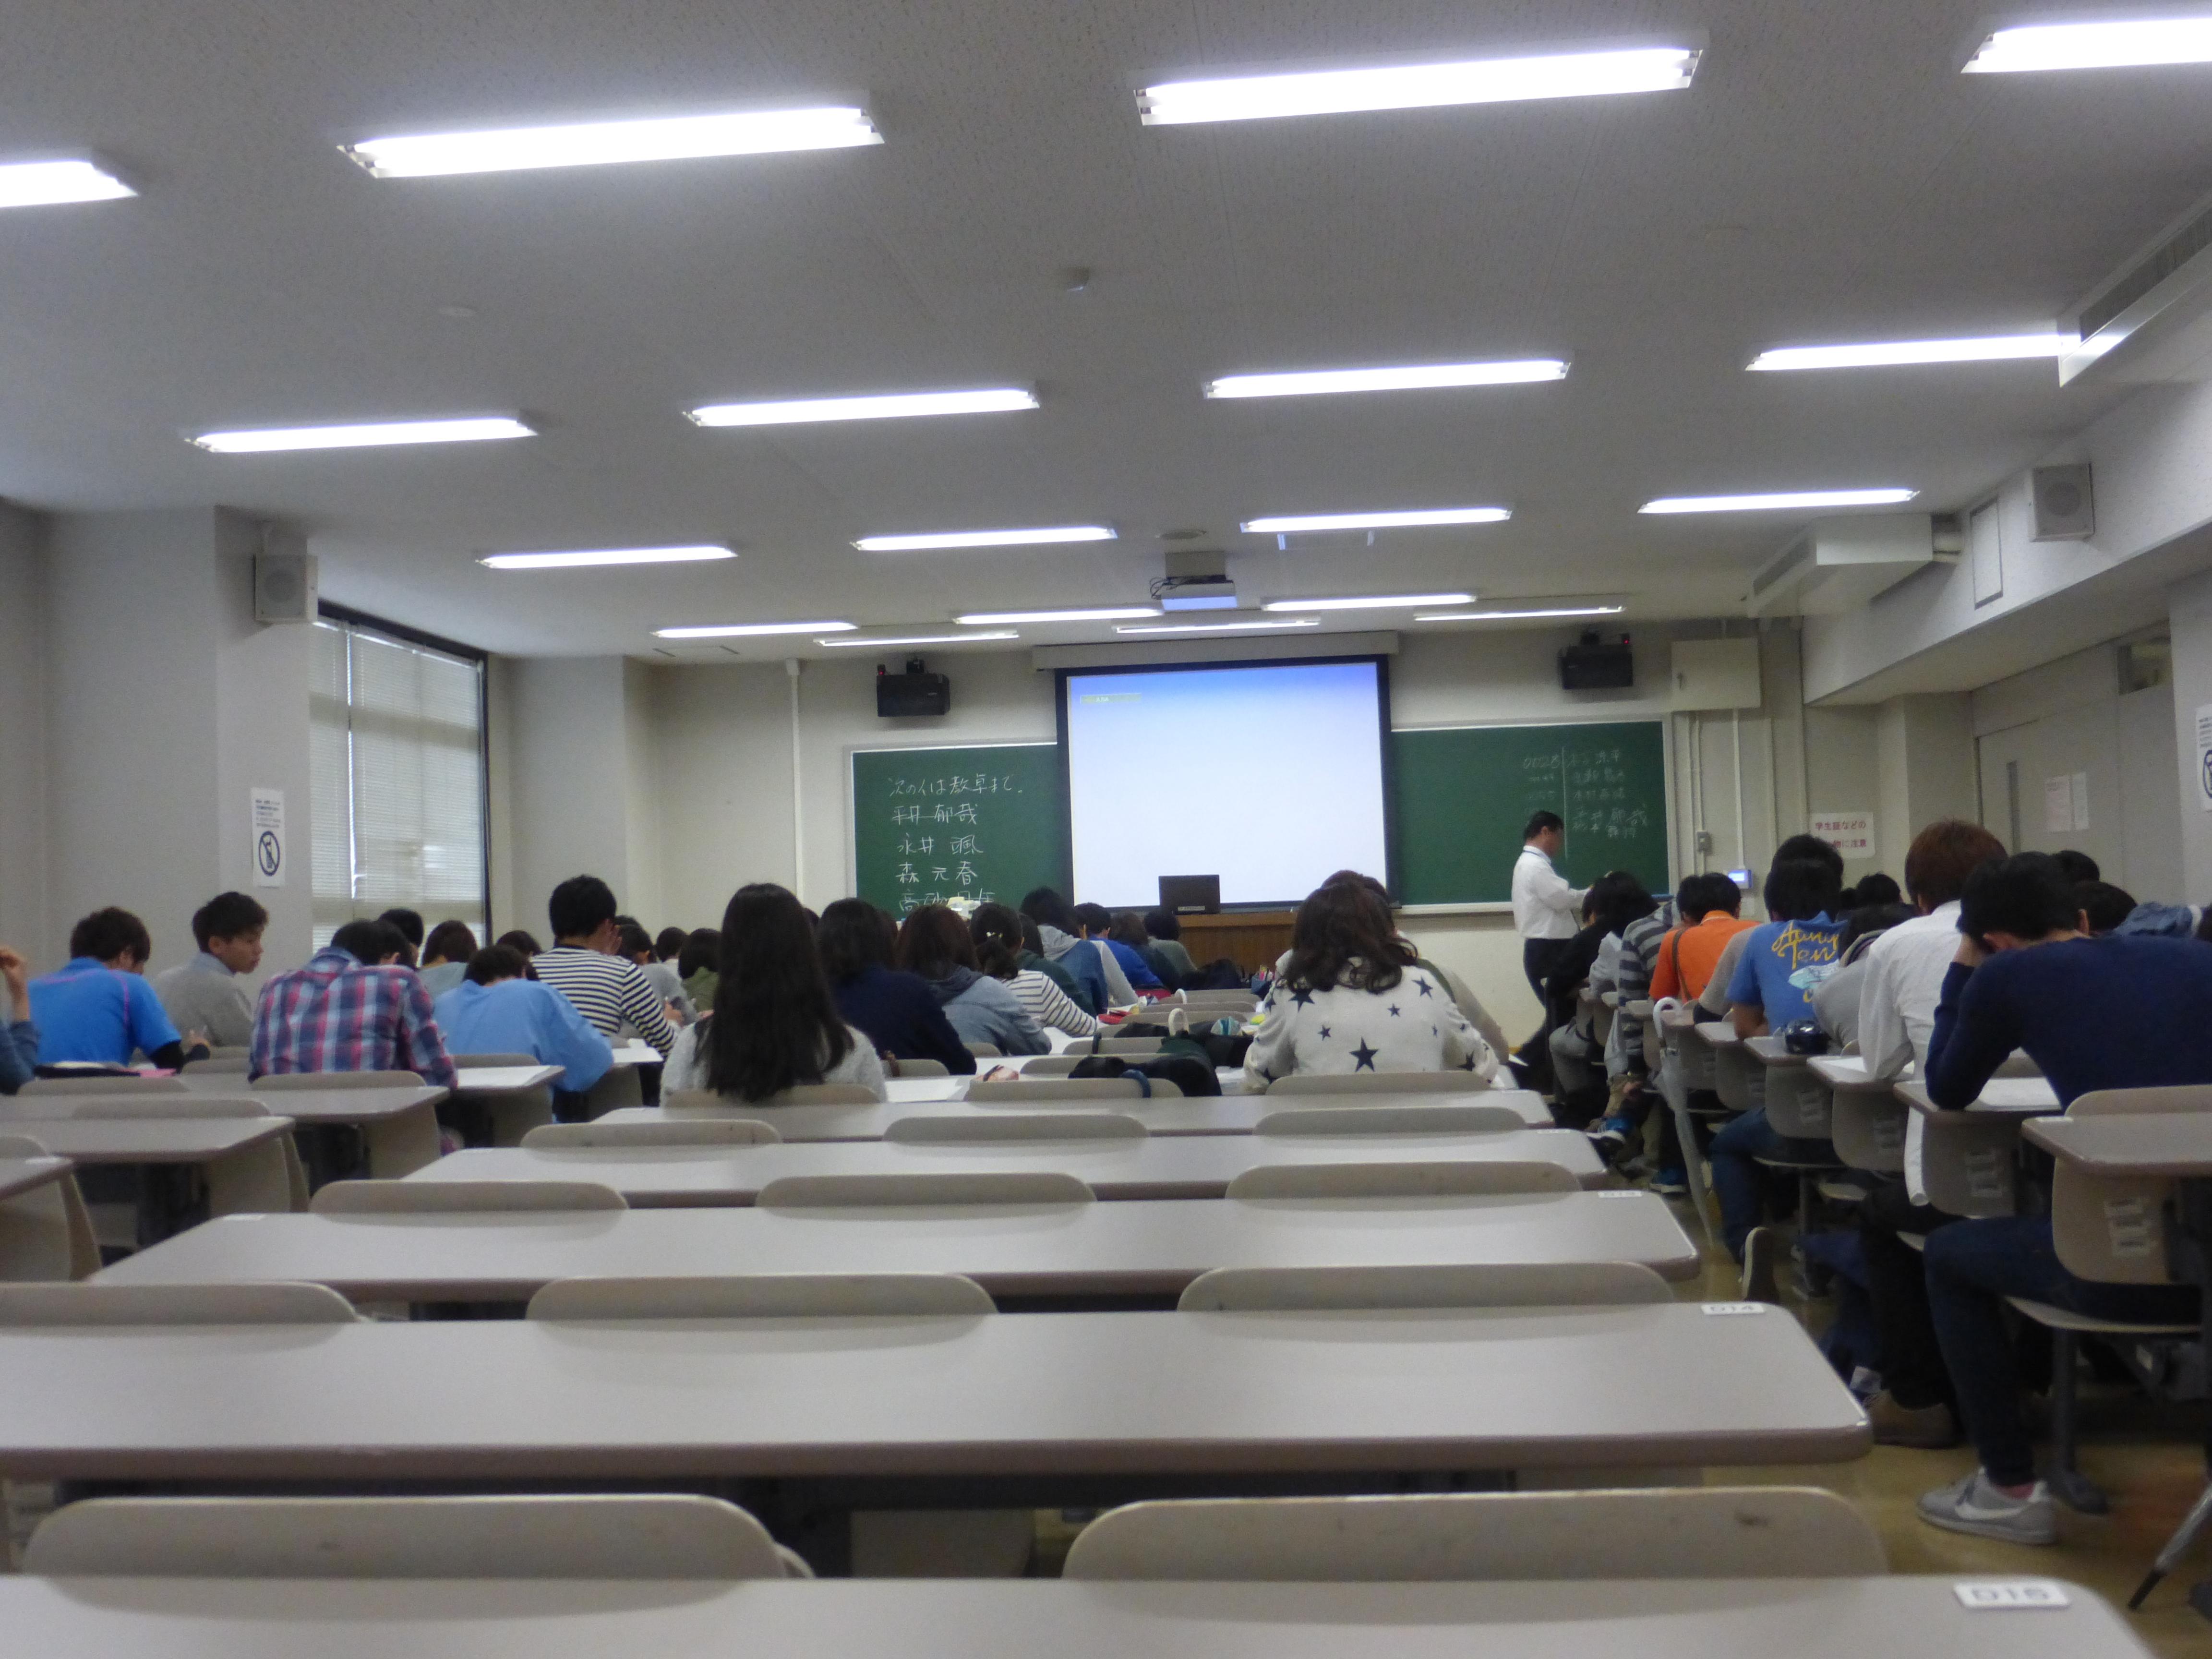 近畿大学経営学部に今年1回目の出講|新着情報|三元ラセン管工業株式会社